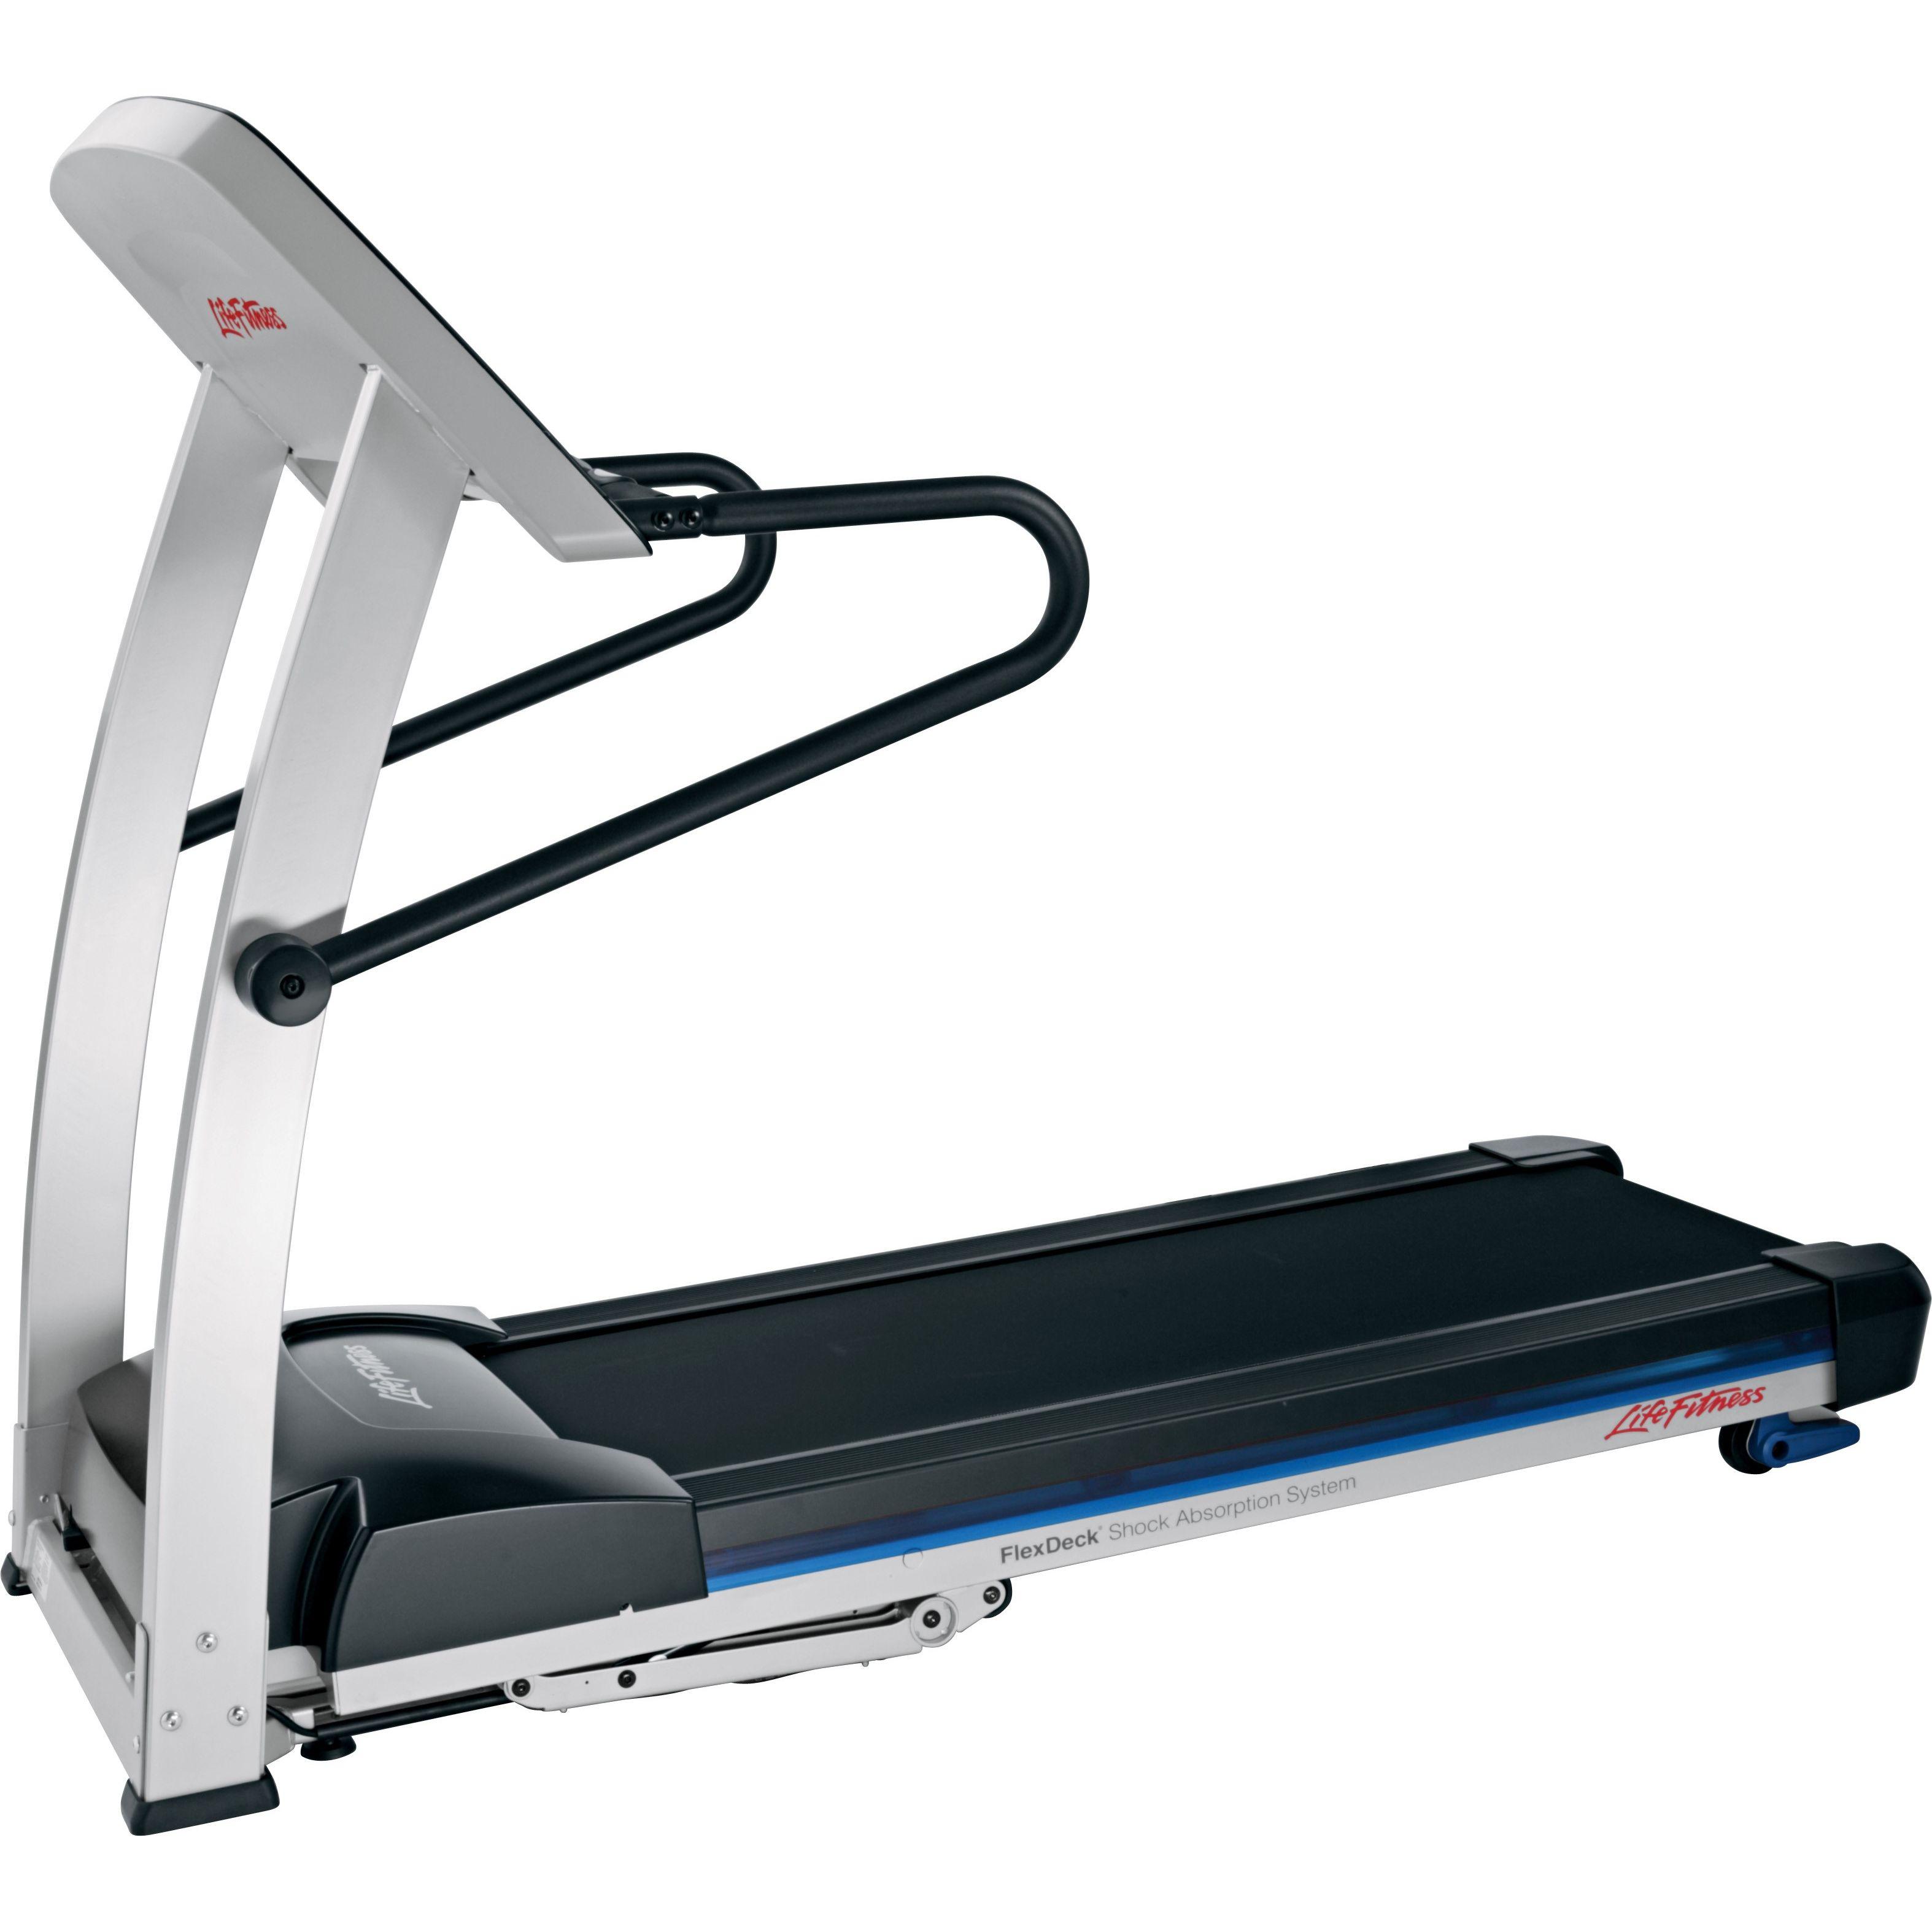 Life Fitness Treadmill Bahrain: Life Fitness F1 Smart Treadmill